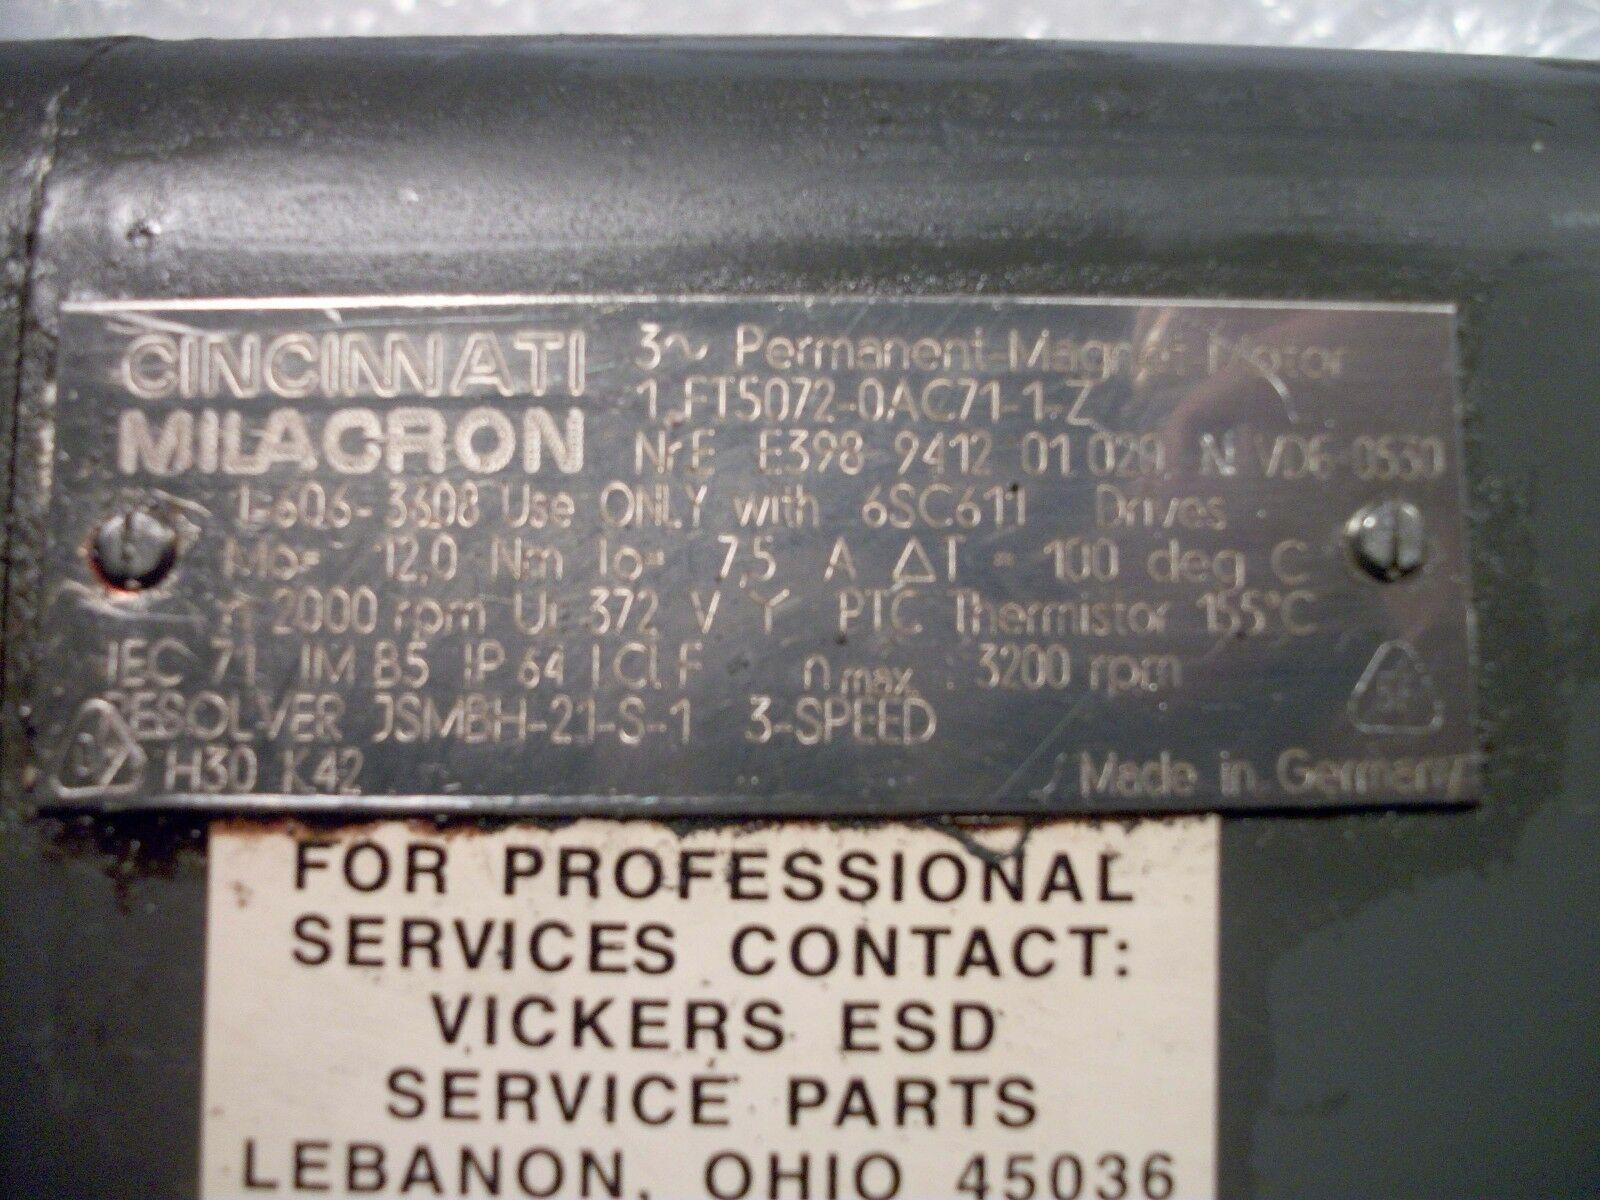 Siemens AC Servo Motor 1FT5072-0AC71-1-Z CMI Part# 1-606-3608